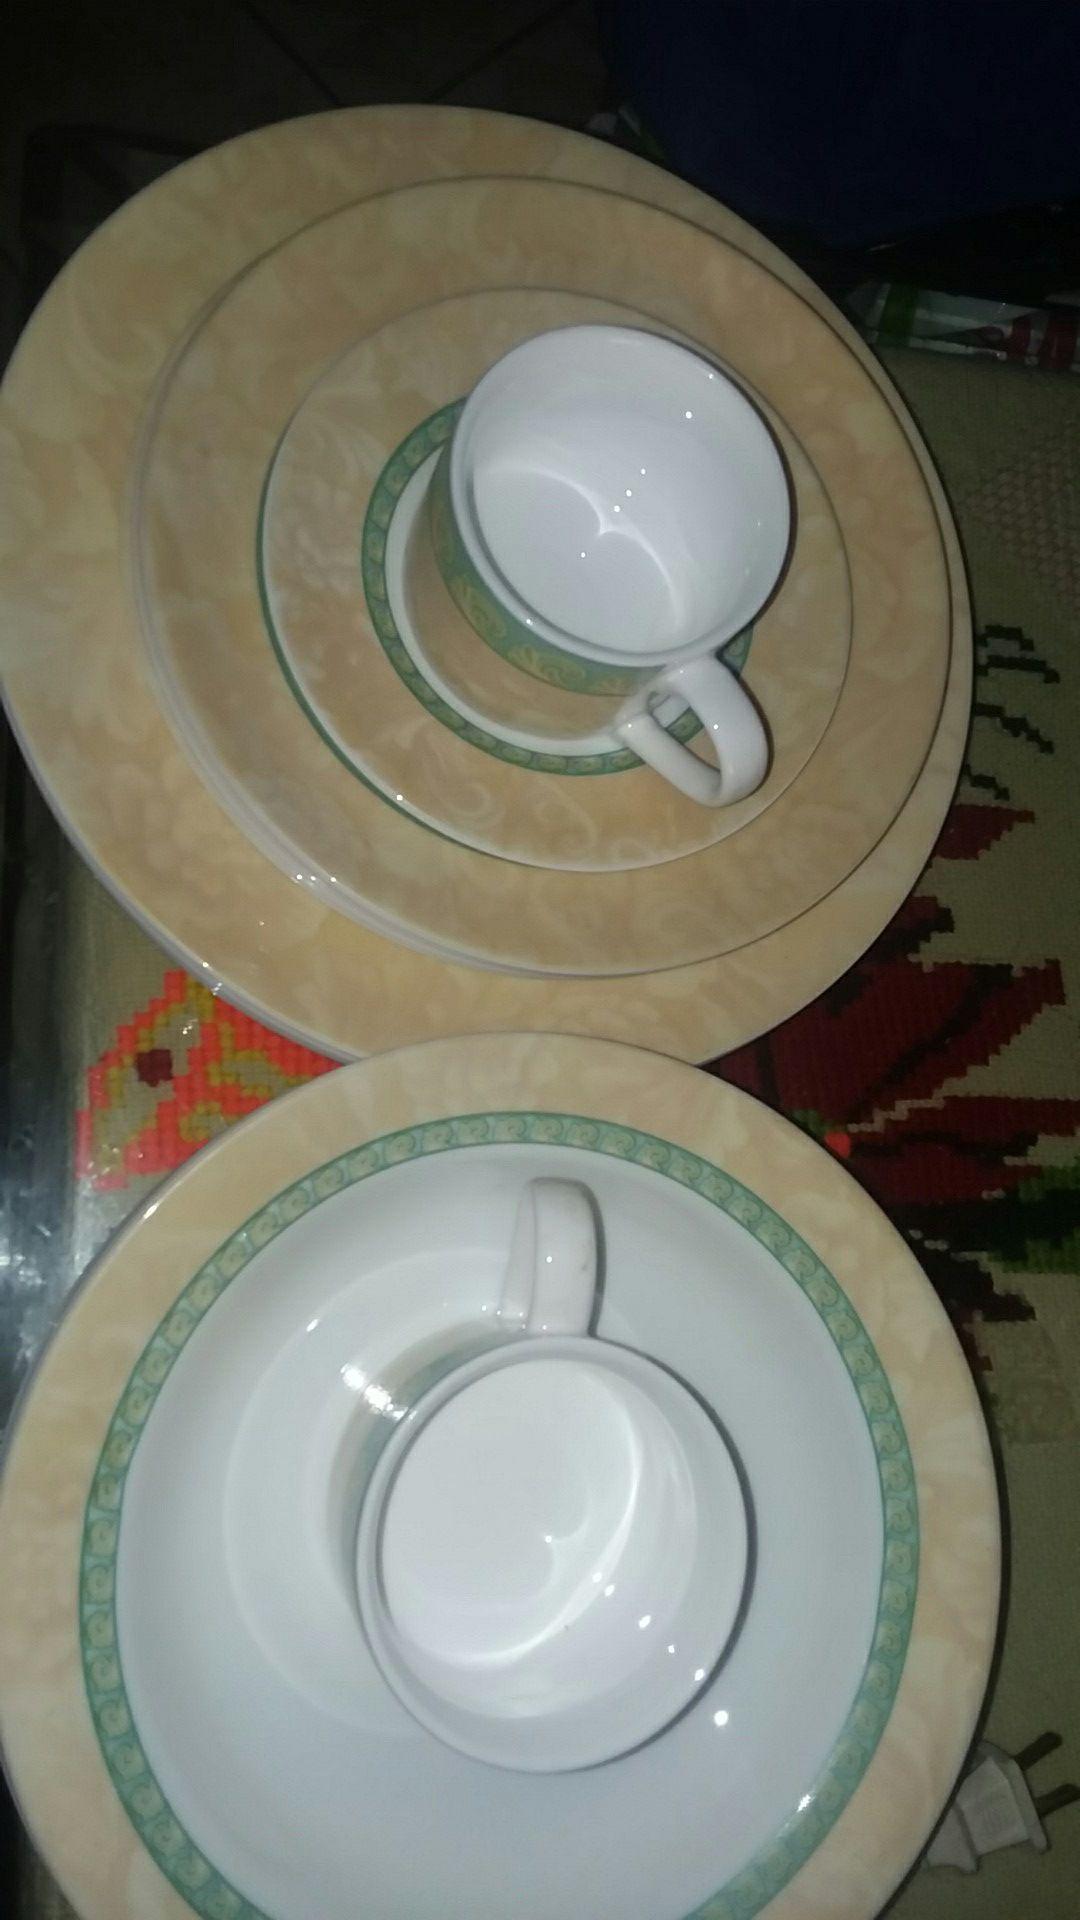 CORNINGWARE DINNERWARE PLATES BOWLS CUPS SET FLORAL LEAF BEAUTIFUL DESIGH